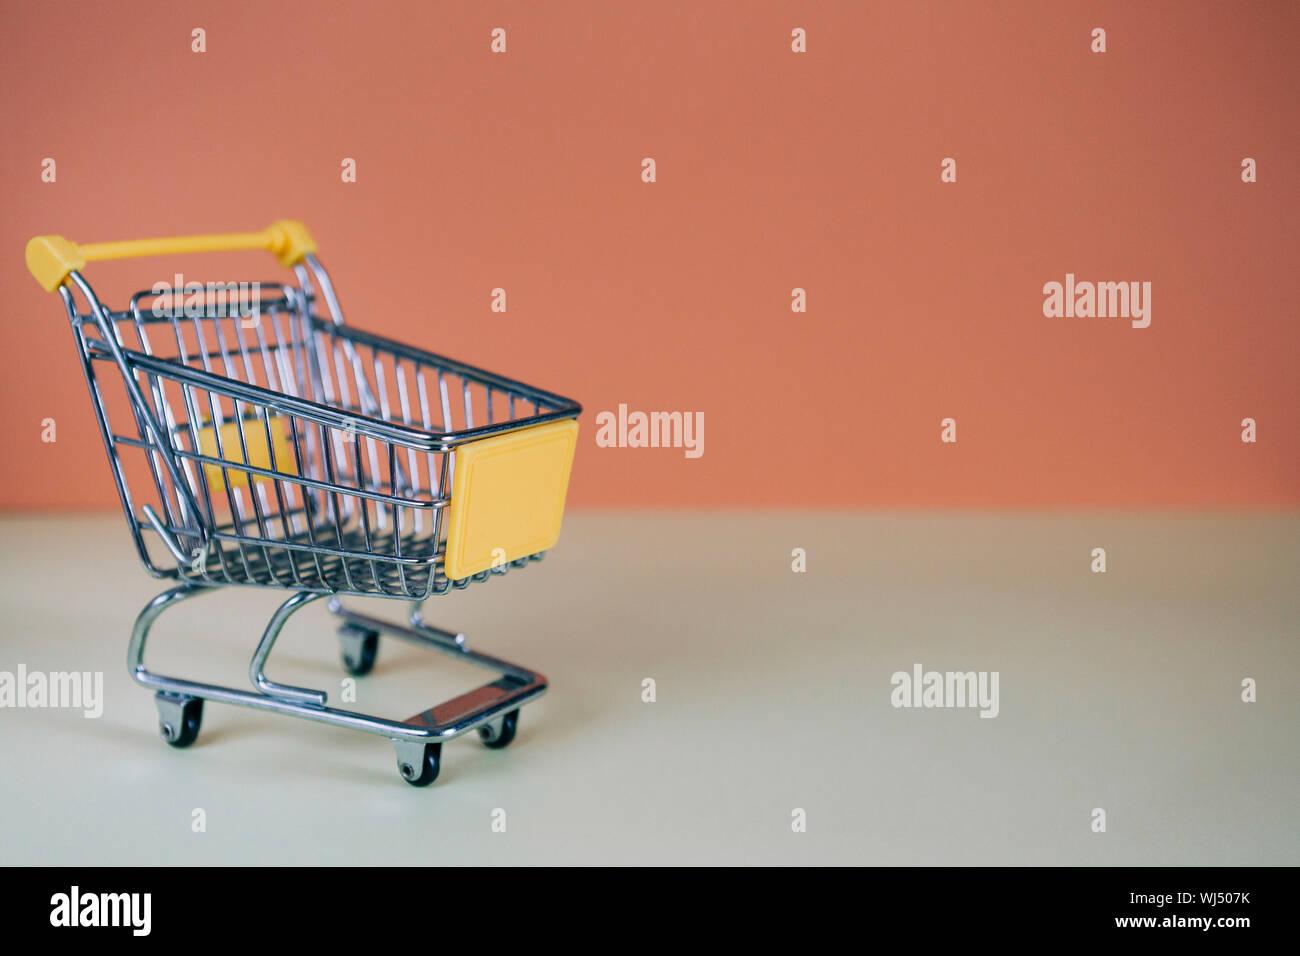 Kleines Spielzeug Warenkorb Stockfoto